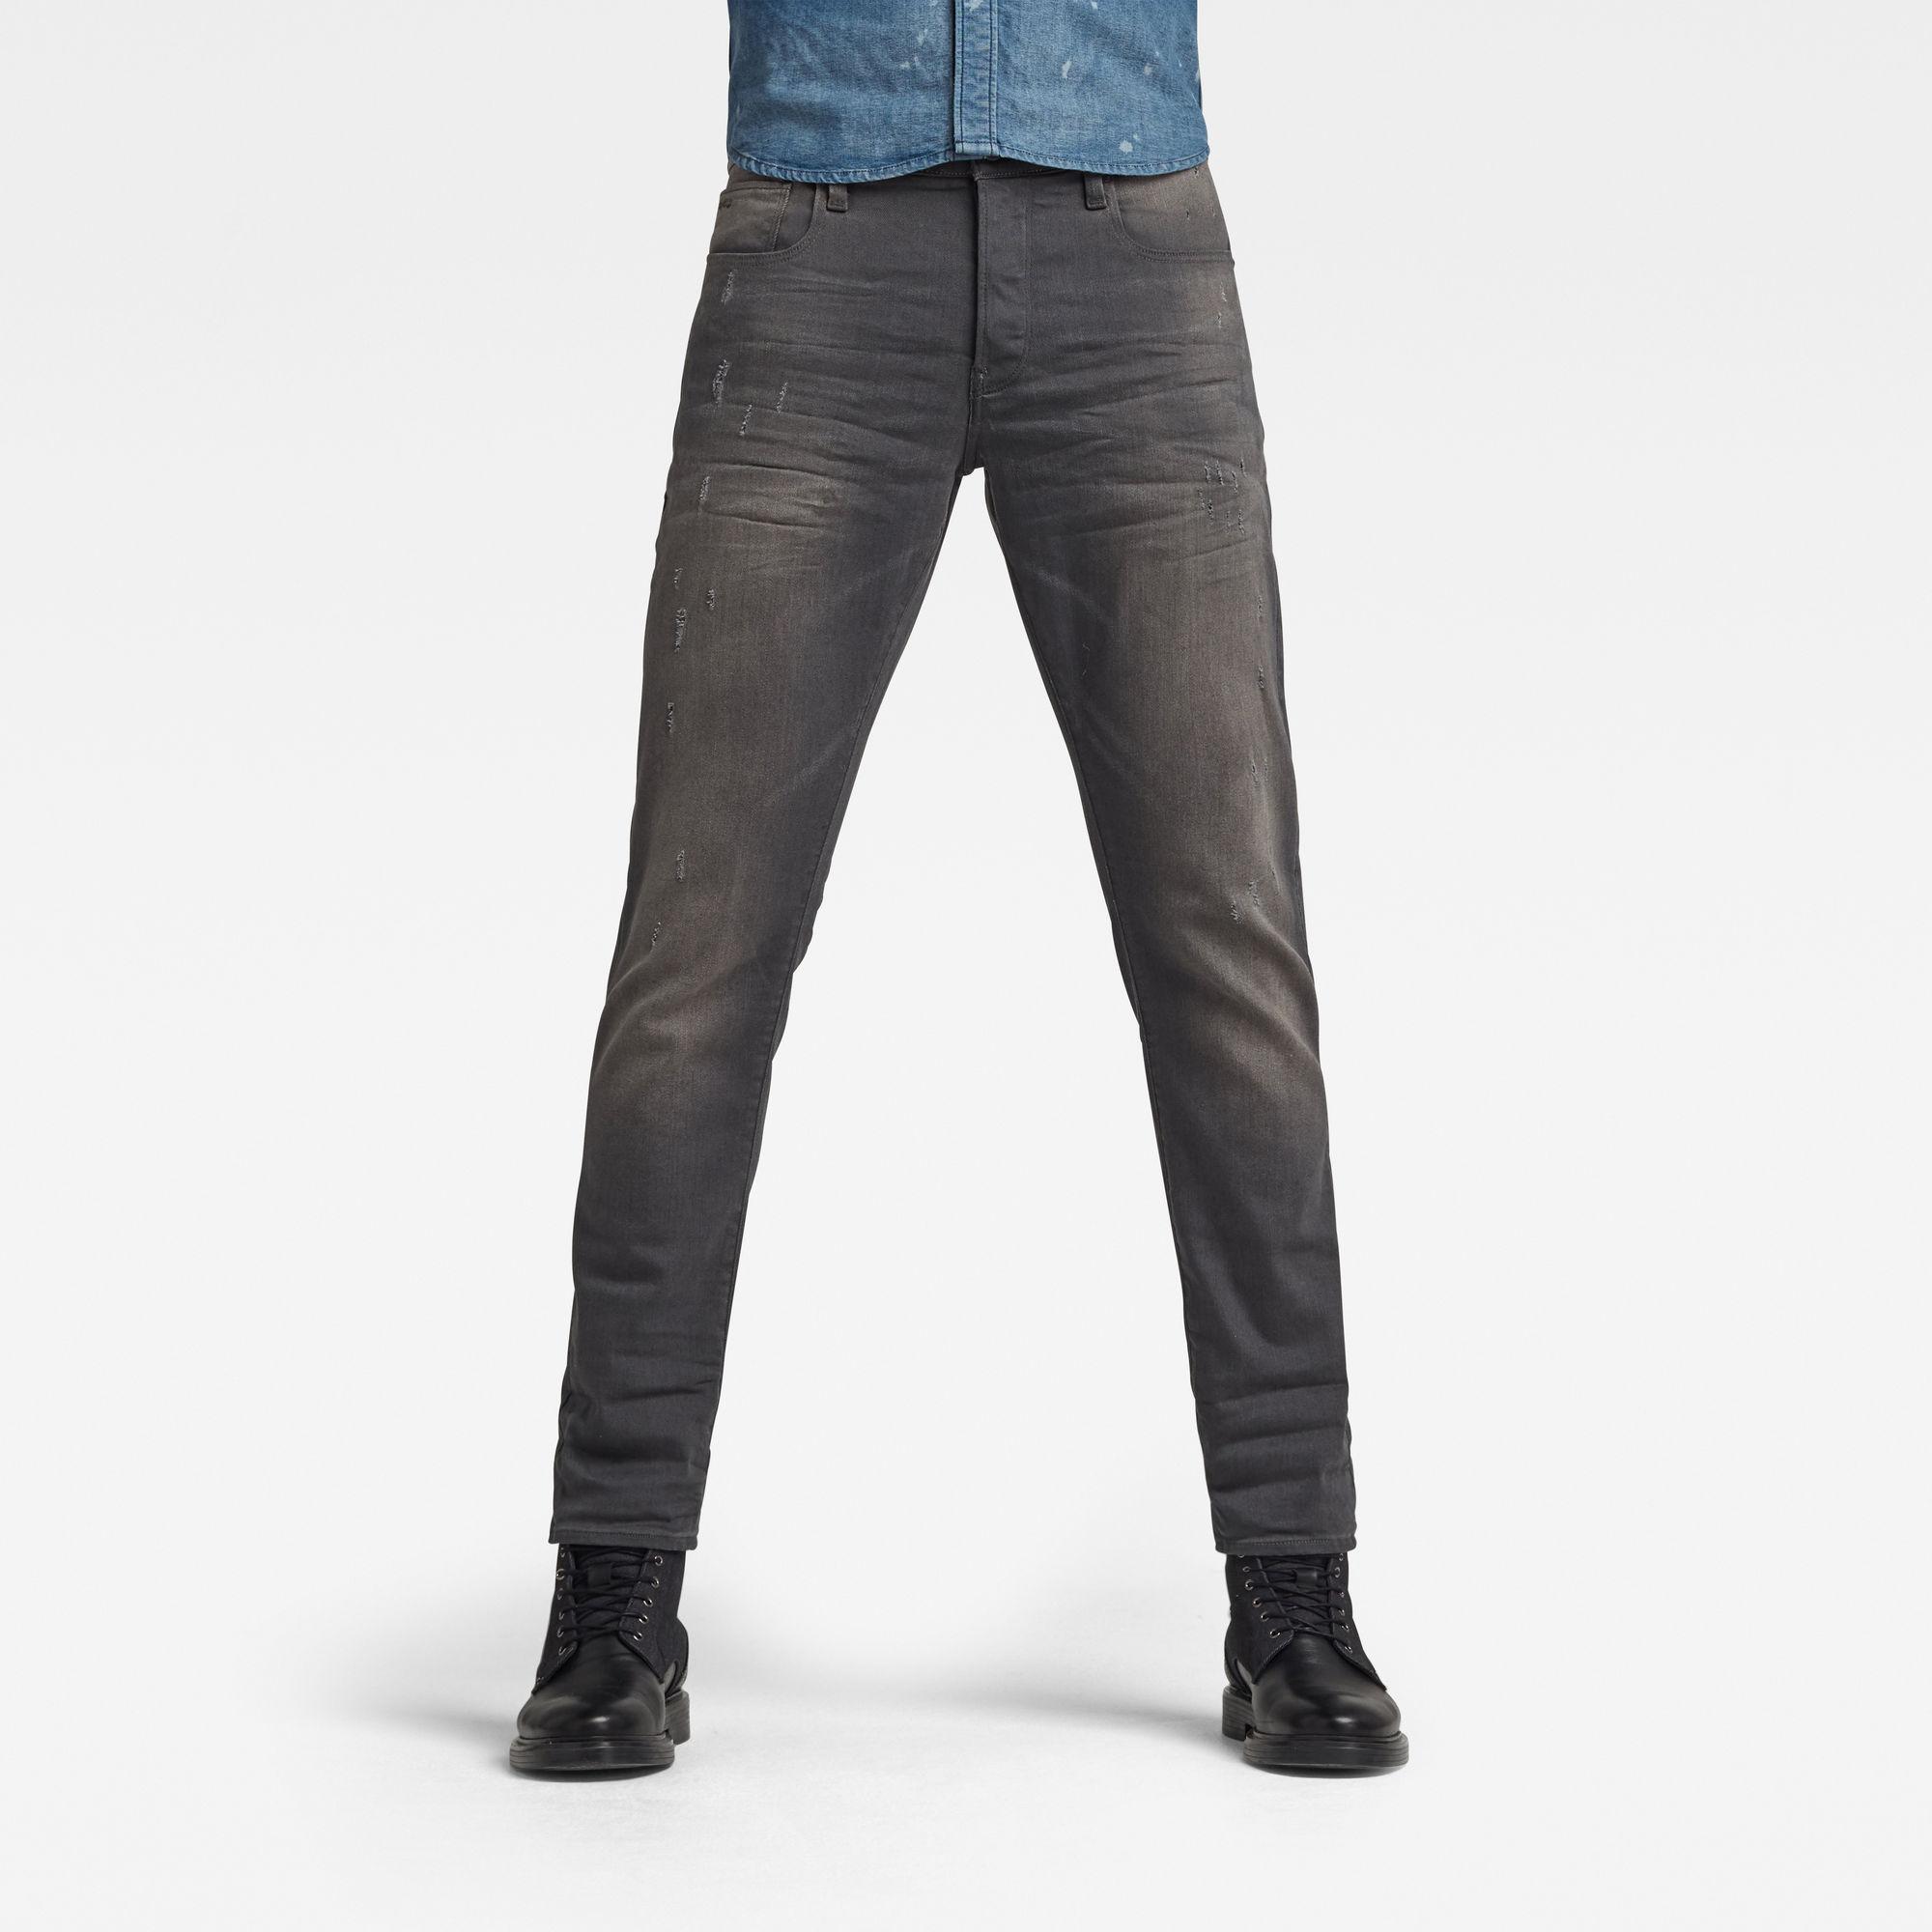 G-Star RAW Heren 3301 Regular Tapered Jeans Lichtblauw